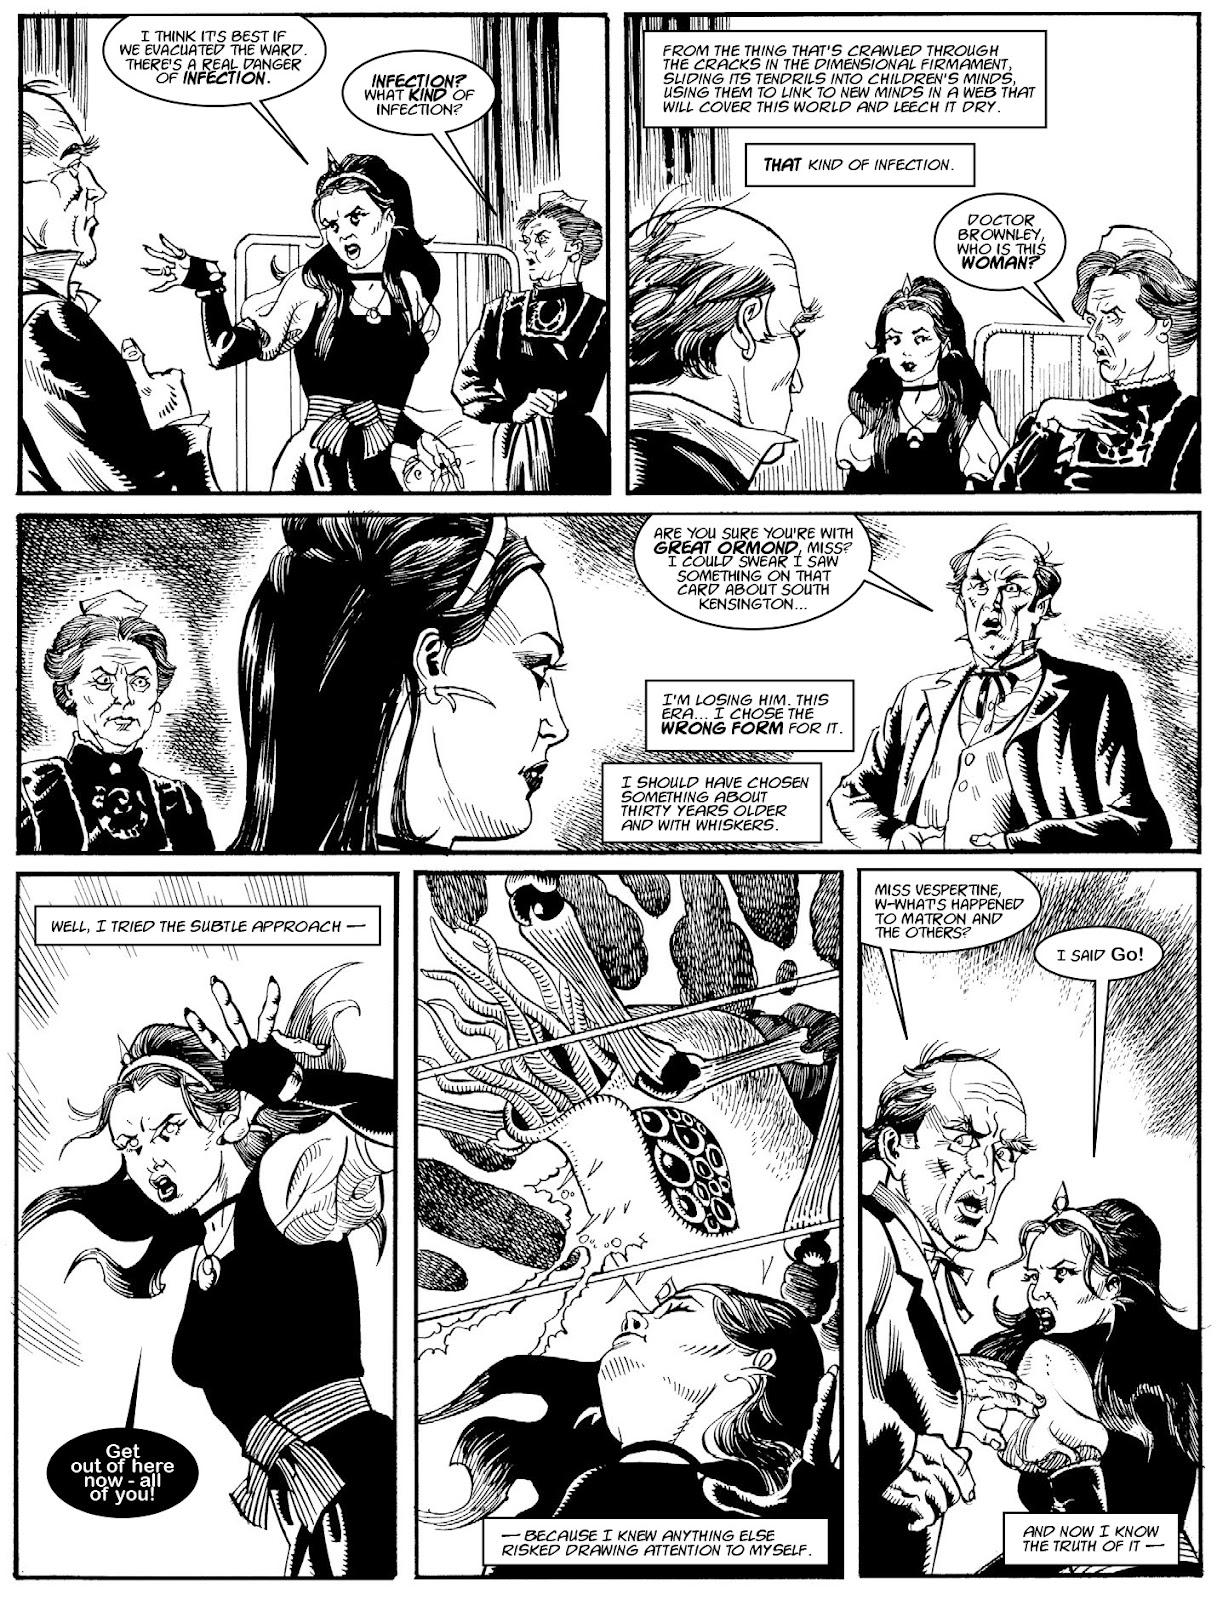 Judge Dredd Megazine (Vol. 5) issue 427 - Page 71